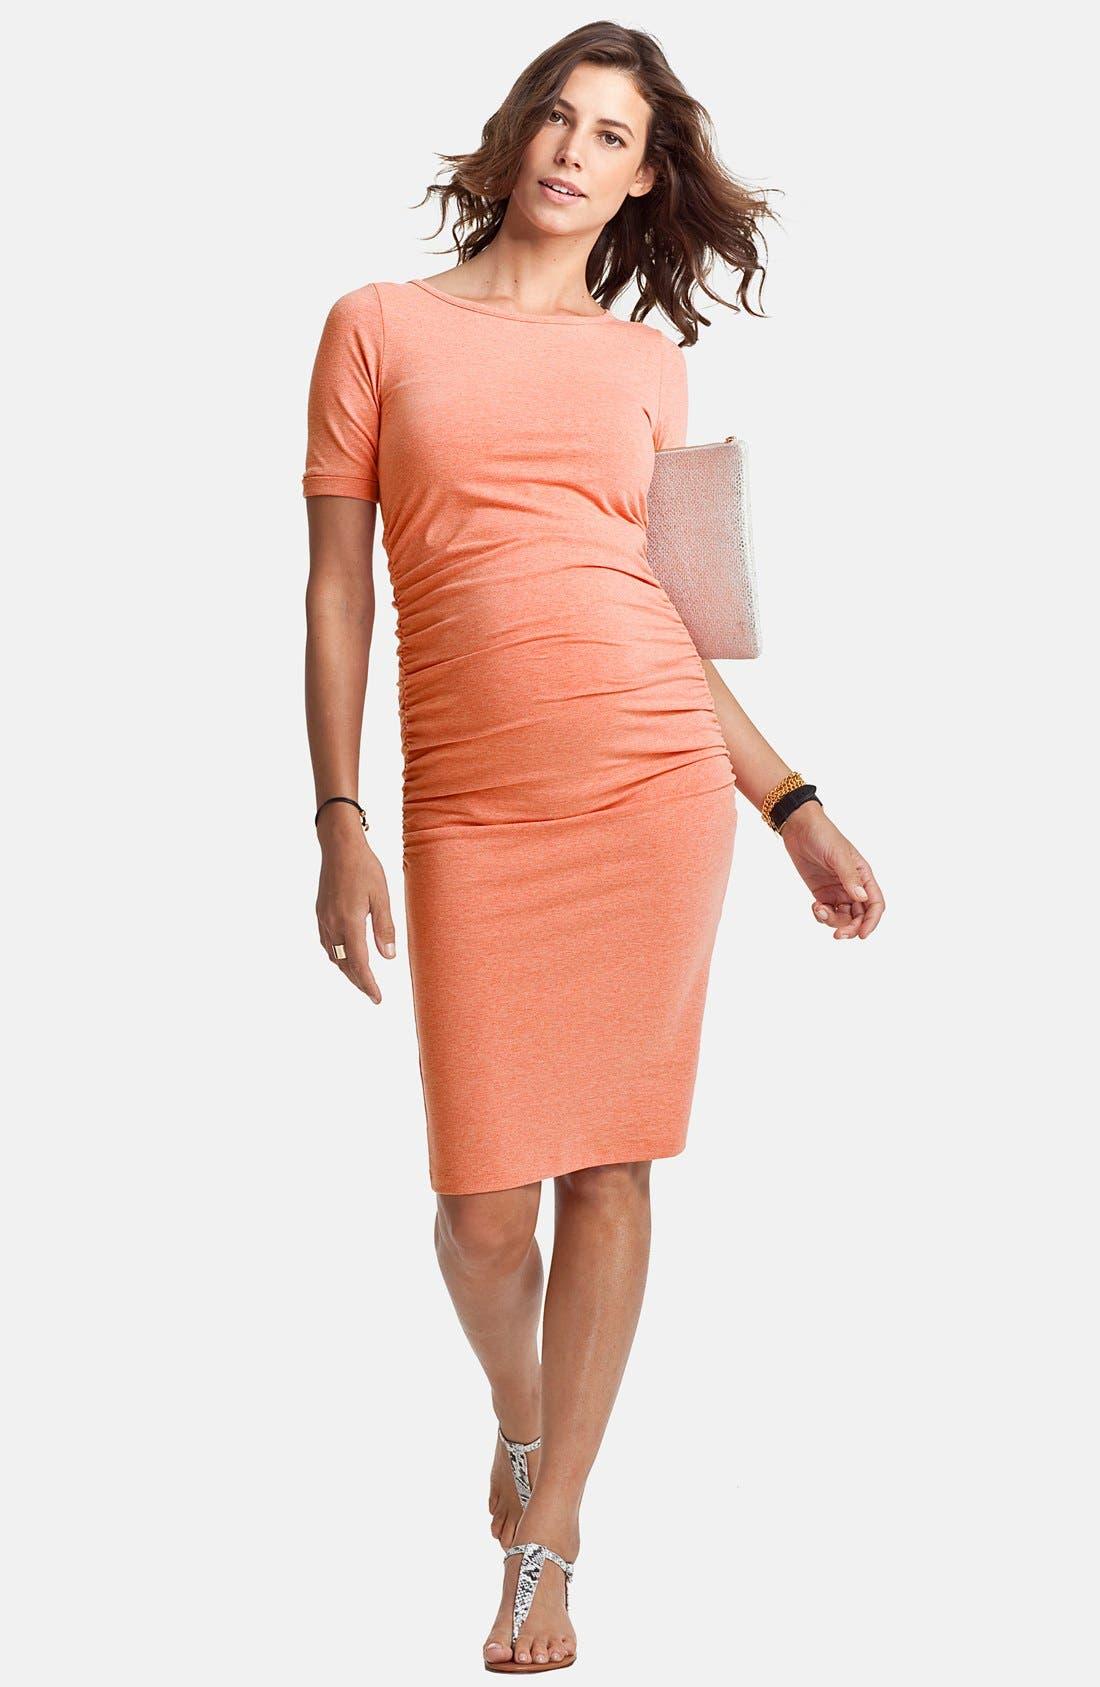 Ruched Maternity Dress,                             Alternate thumbnail 2, color,                             PALE ORANGE MELANGE